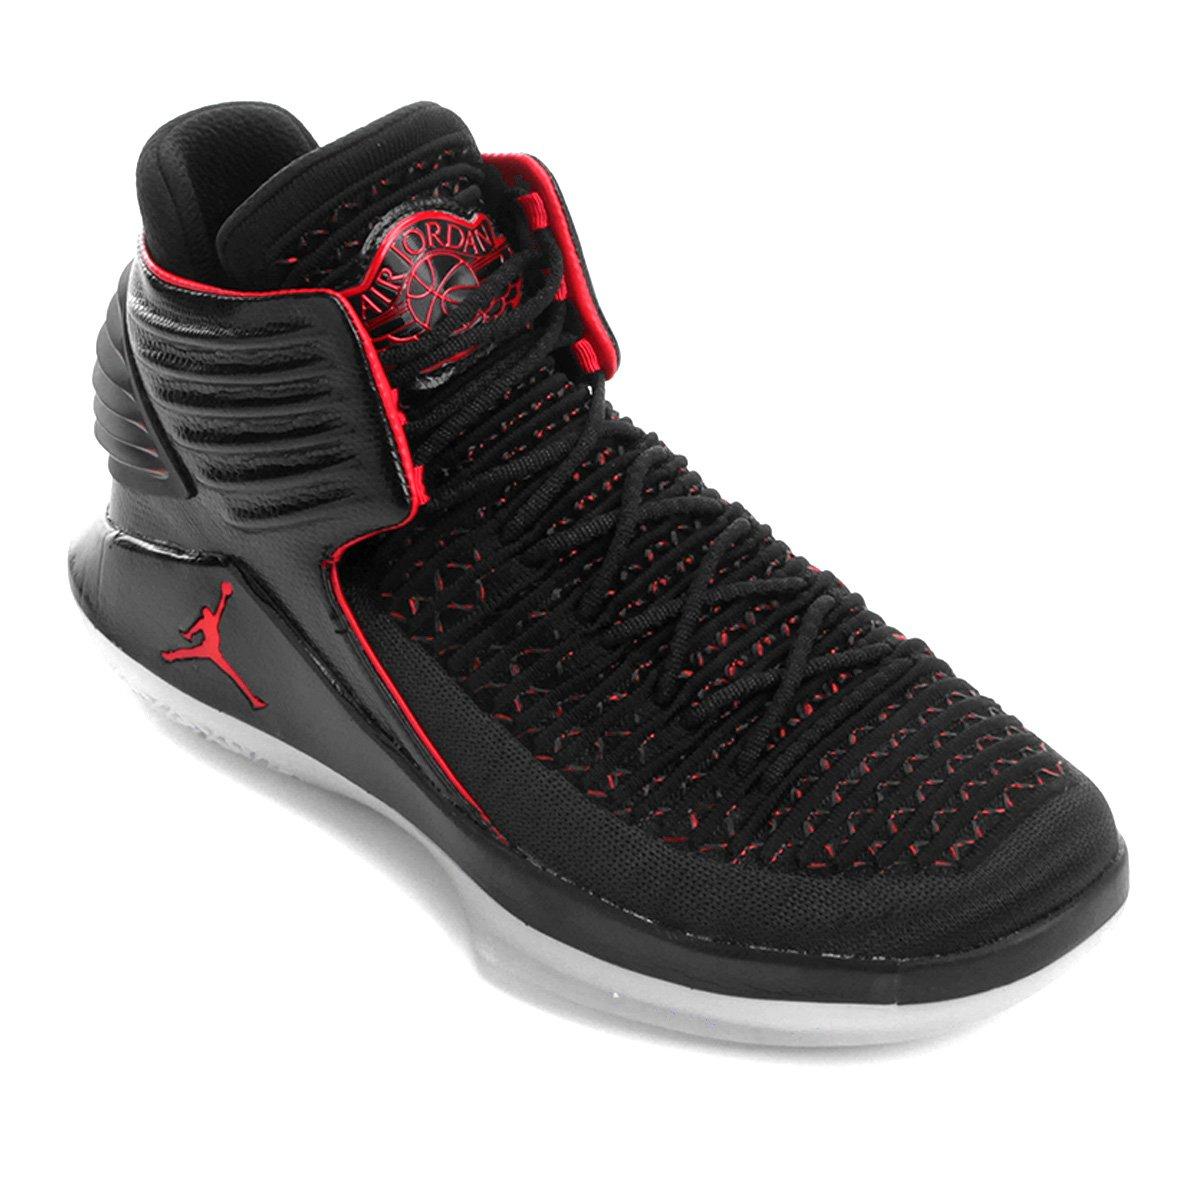 b86deaefff177 Tênis Nike Air Jordan XXXII Masculino - Compre Agora